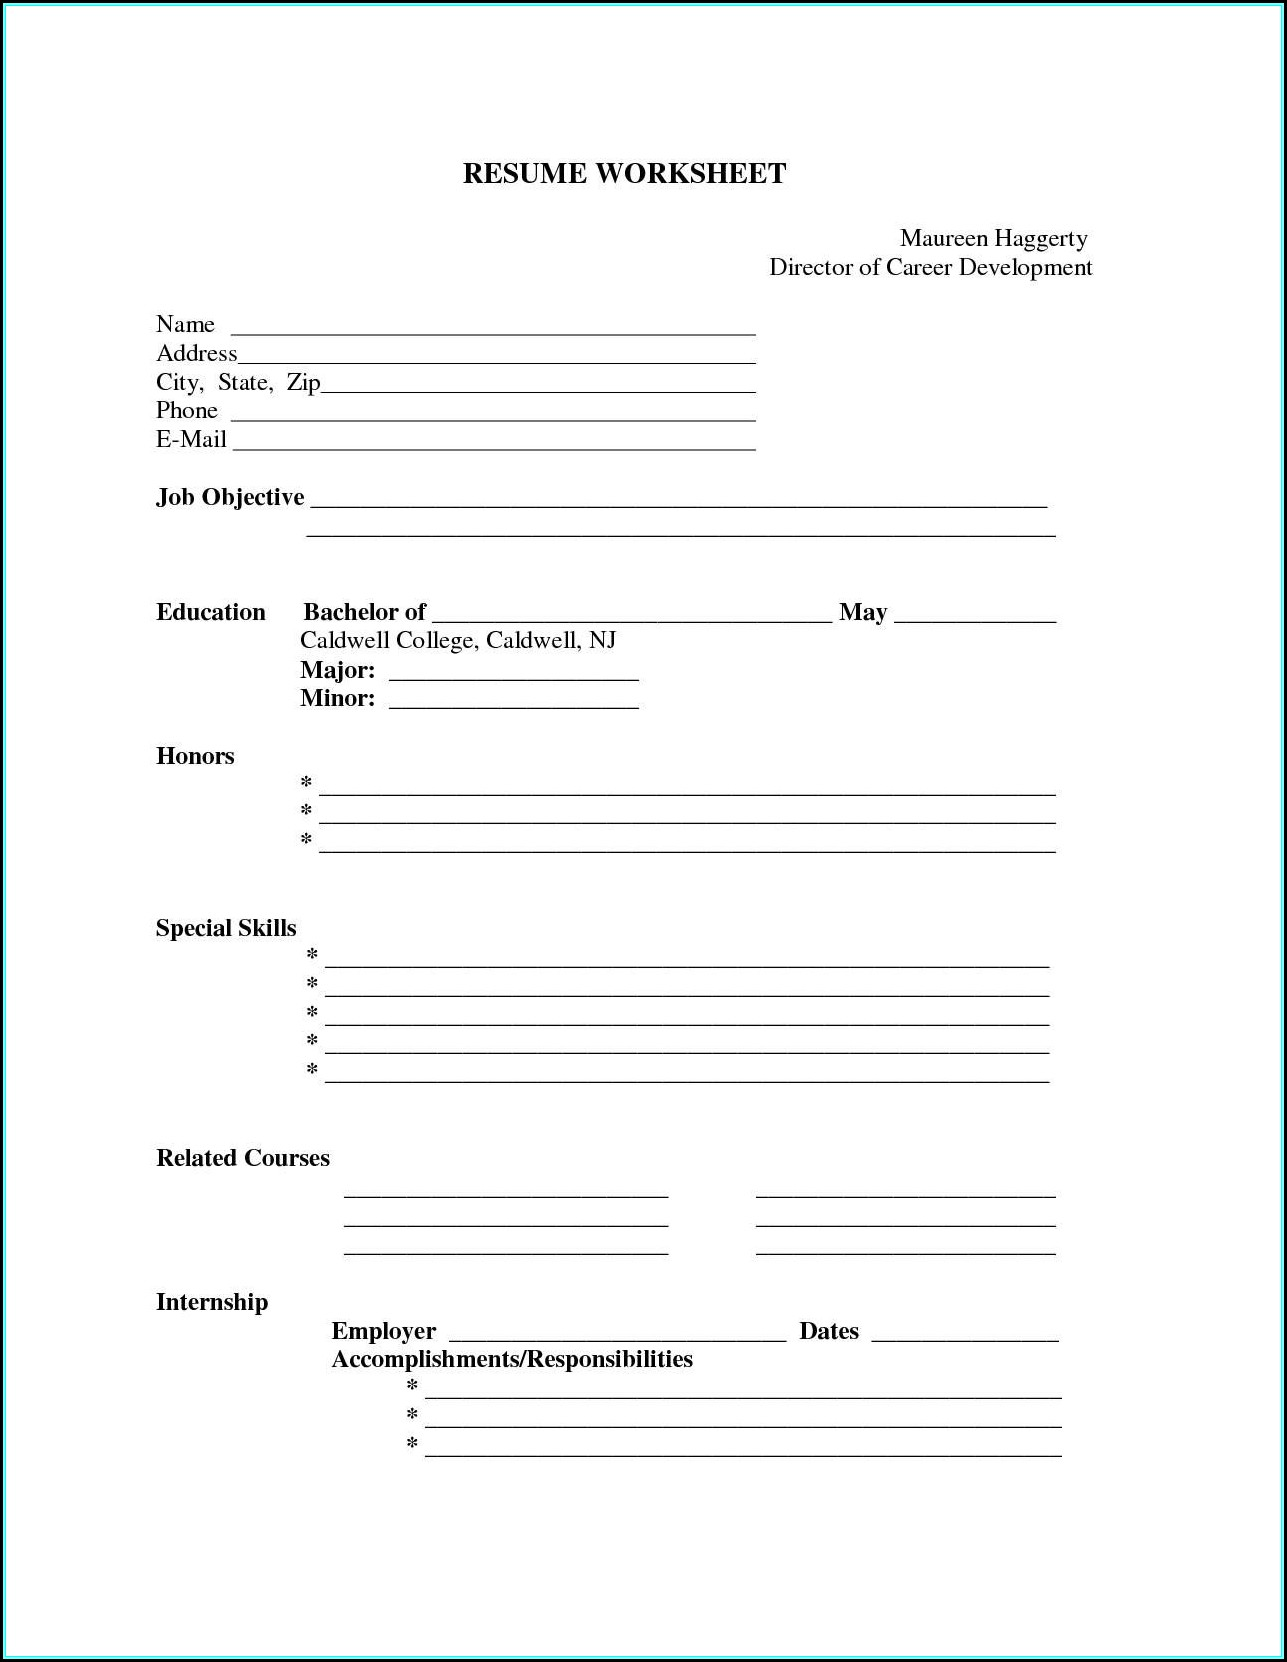 Resume Templates Printable Free